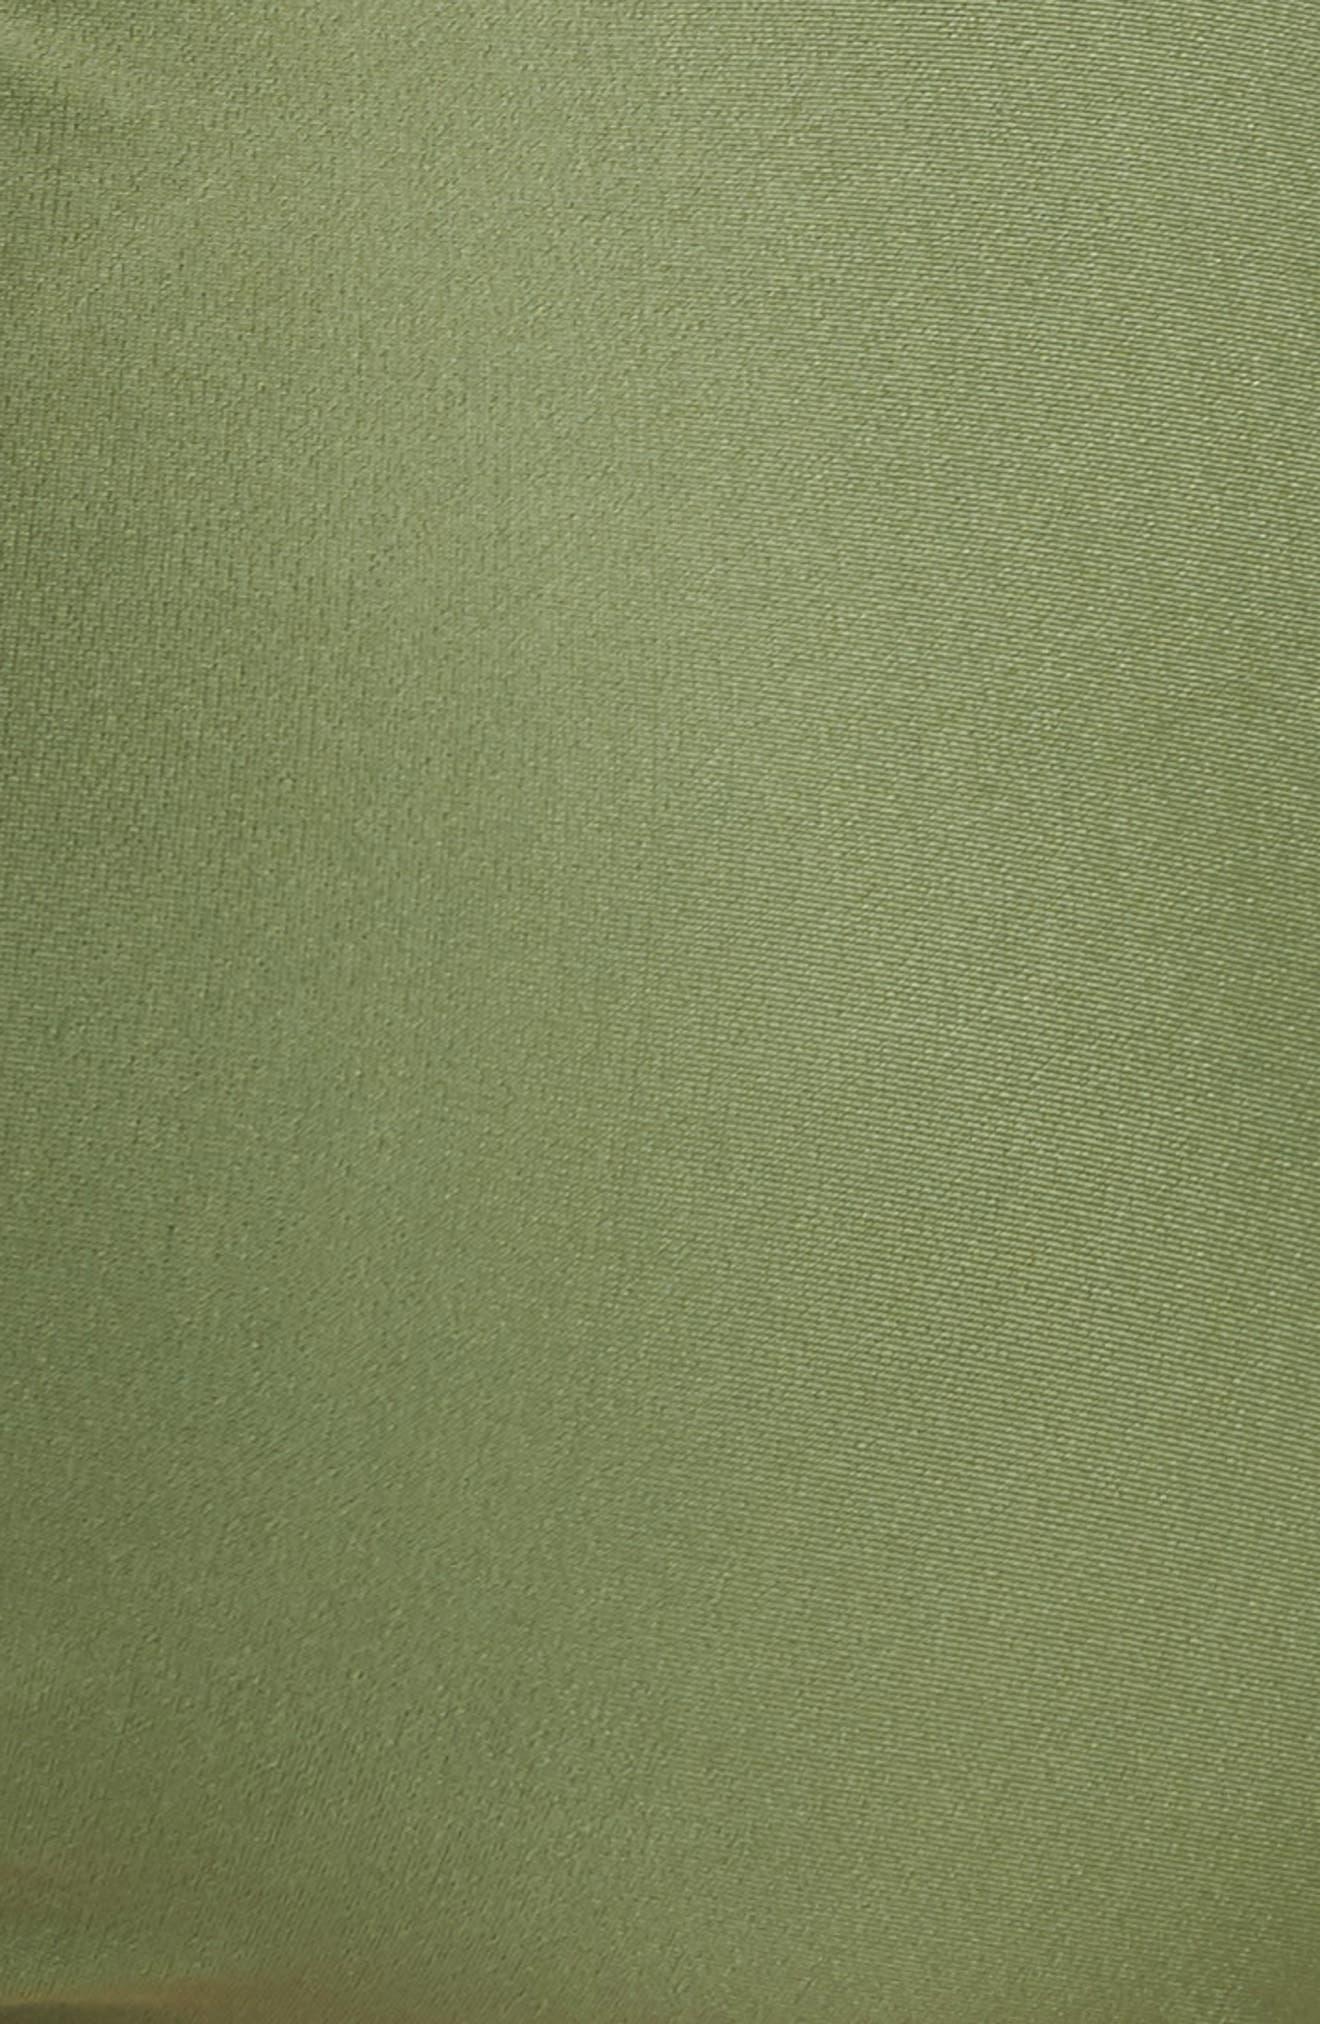 Enchanted Bralette,                             Alternate thumbnail 5, color,                             MOSS